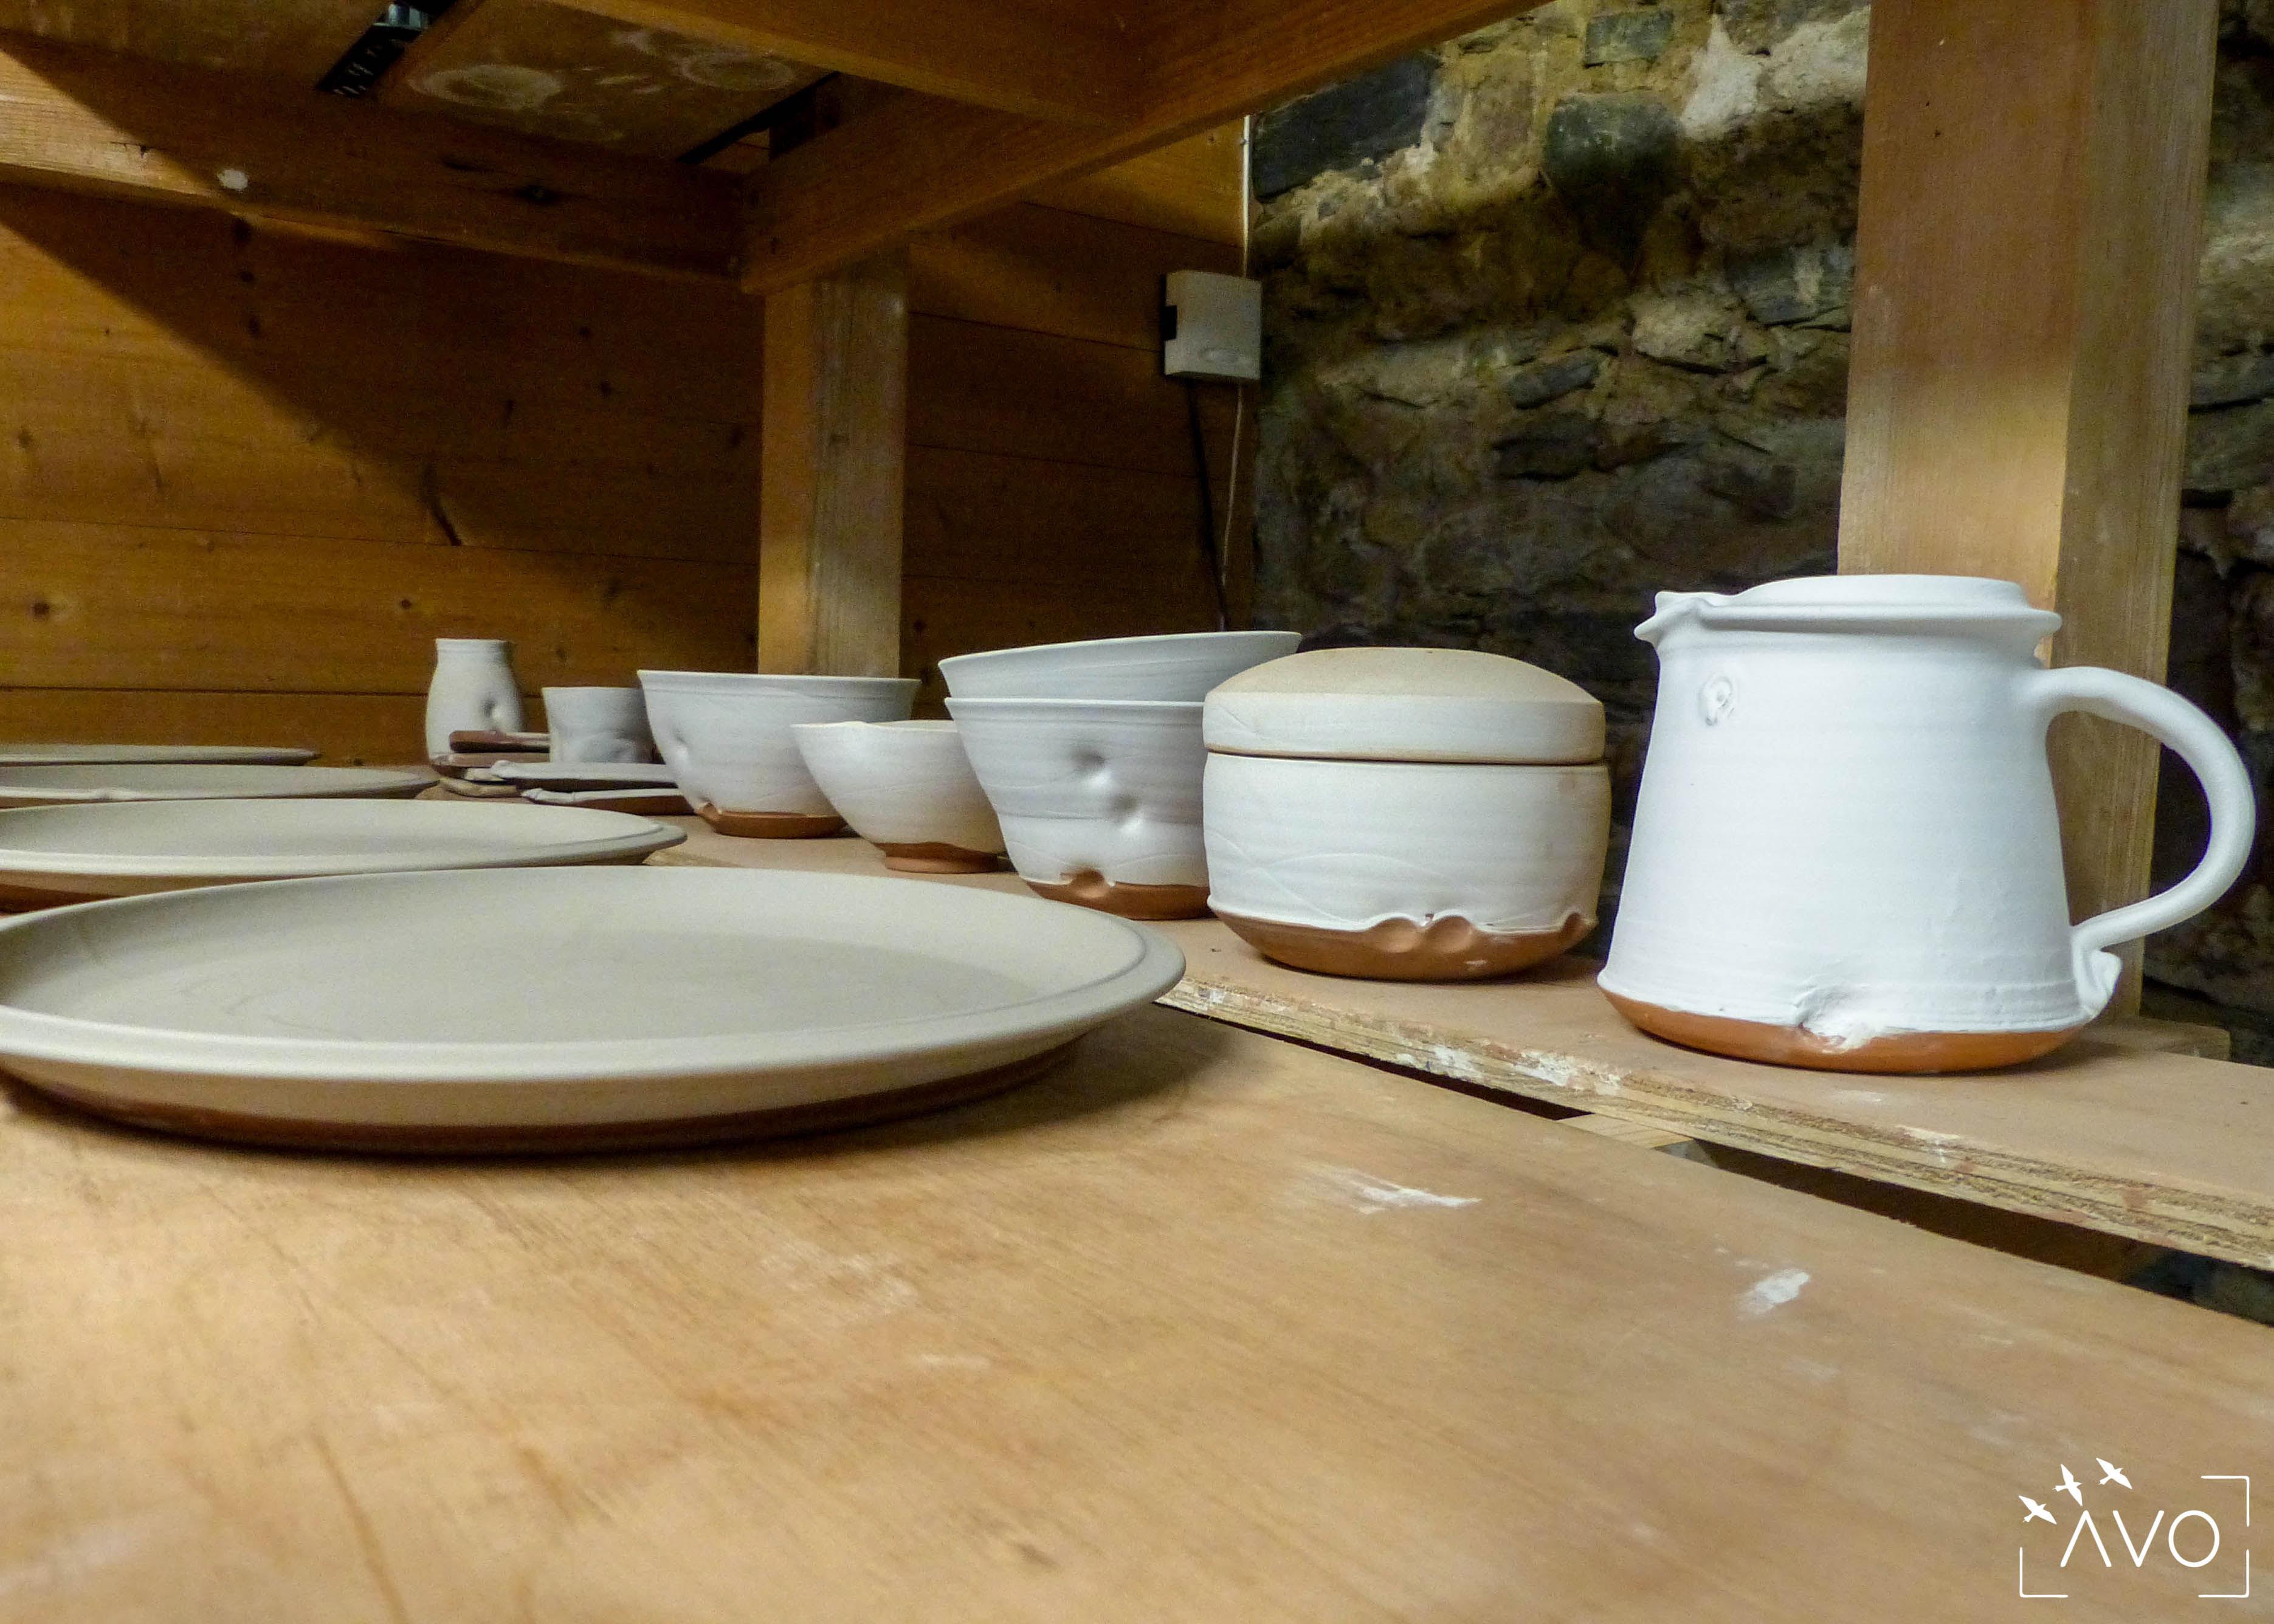 marina-leflon-ceramiste-courzieu-atelier-gres-faience-fleurs-terre-avo-avoldooiseau-ceramiques-art-de-la-table-atelier-poterie